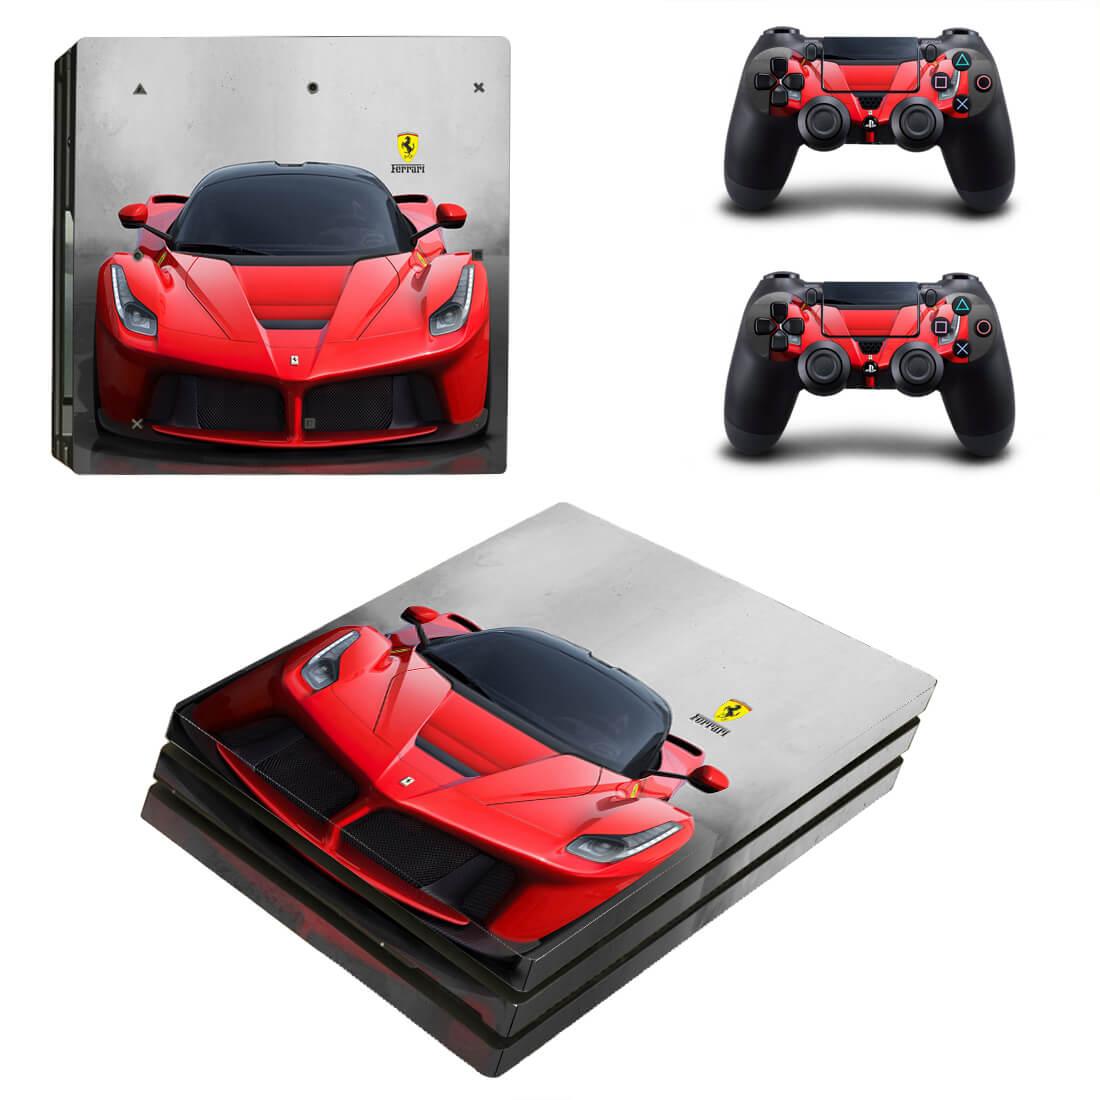 Ferrari PS4 Pro skin